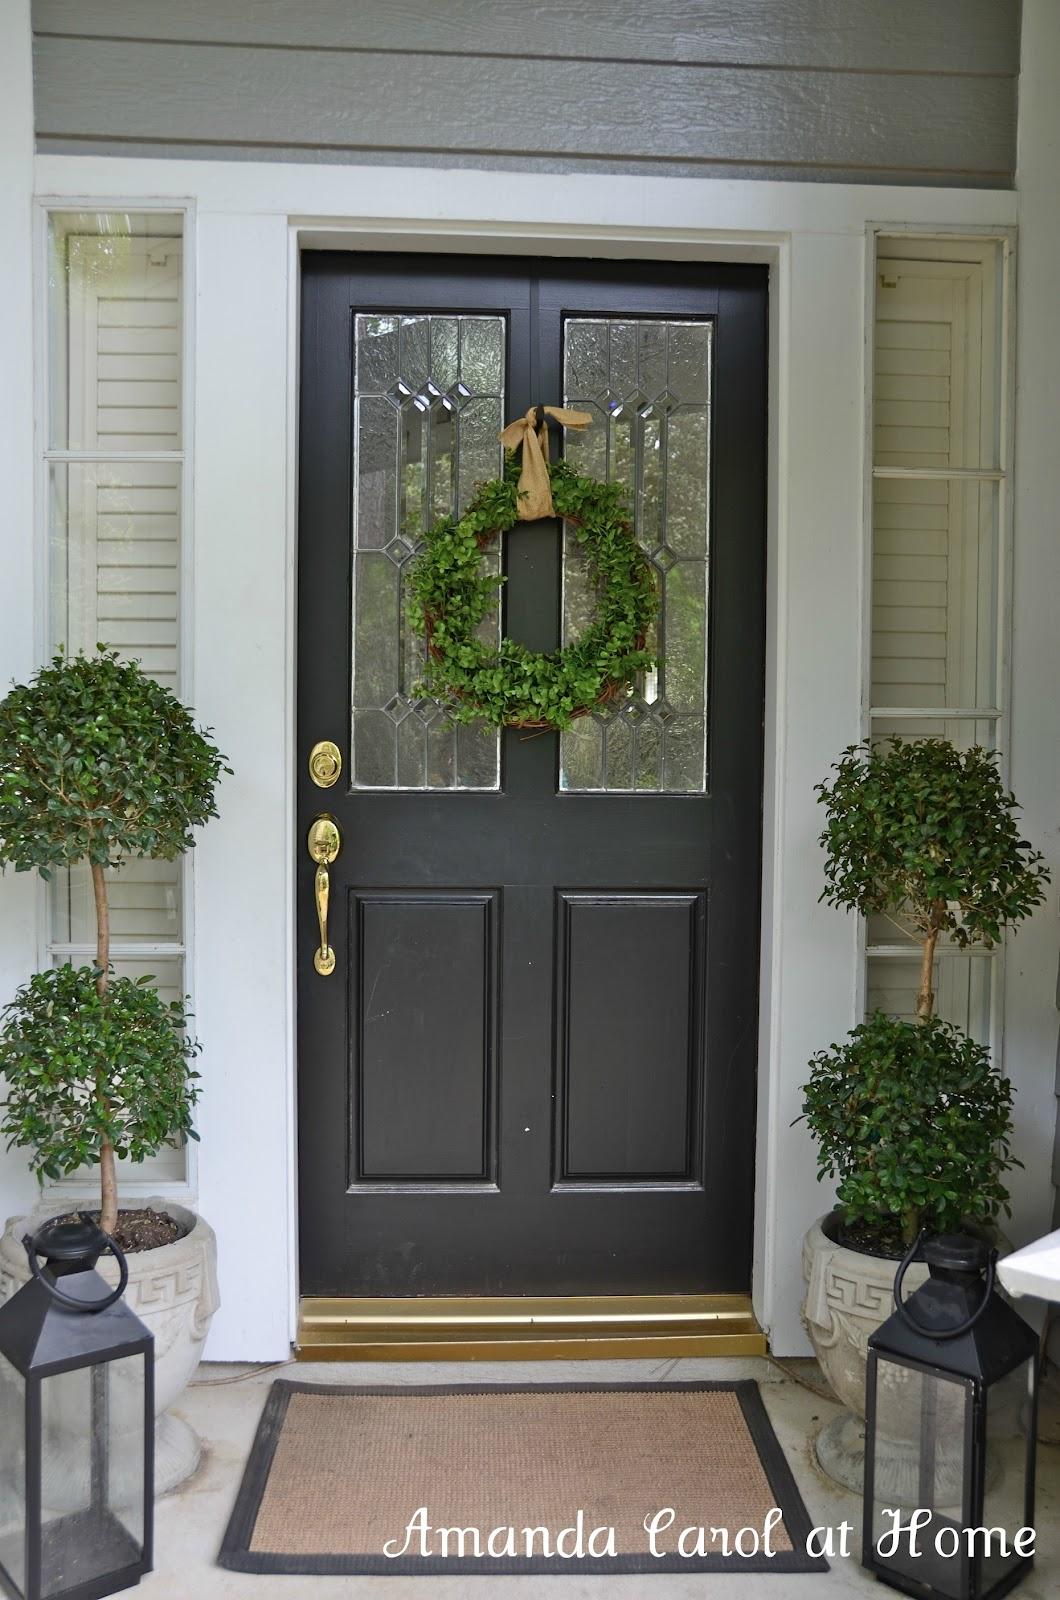 1000 images about front doors on pinterest black front doors front doors and black doors. Black Bedroom Furniture Sets. Home Design Ideas